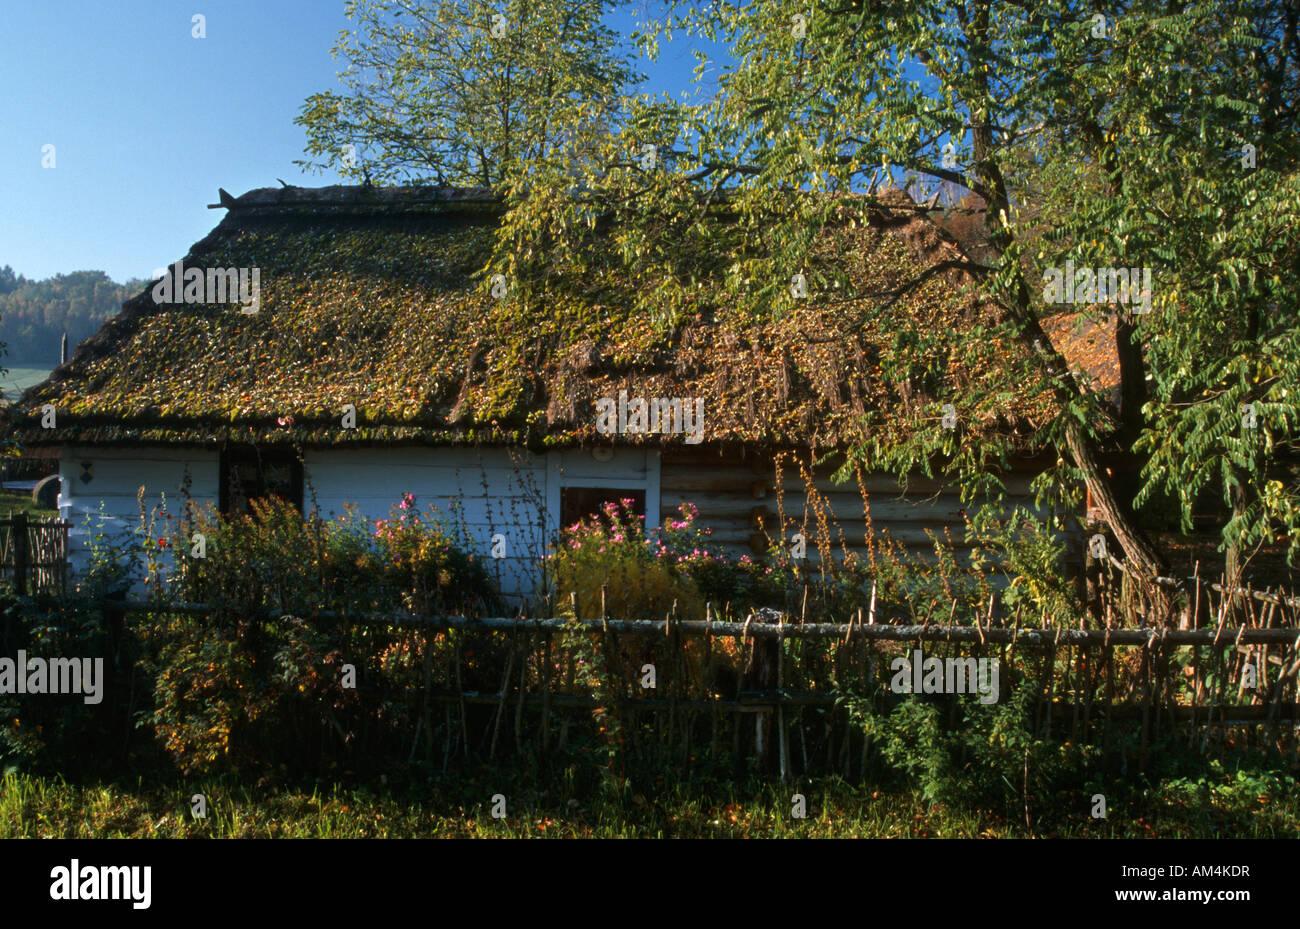 heritage park Zagroda Guciow farm Roztocze region in south east Poland Stock Photo